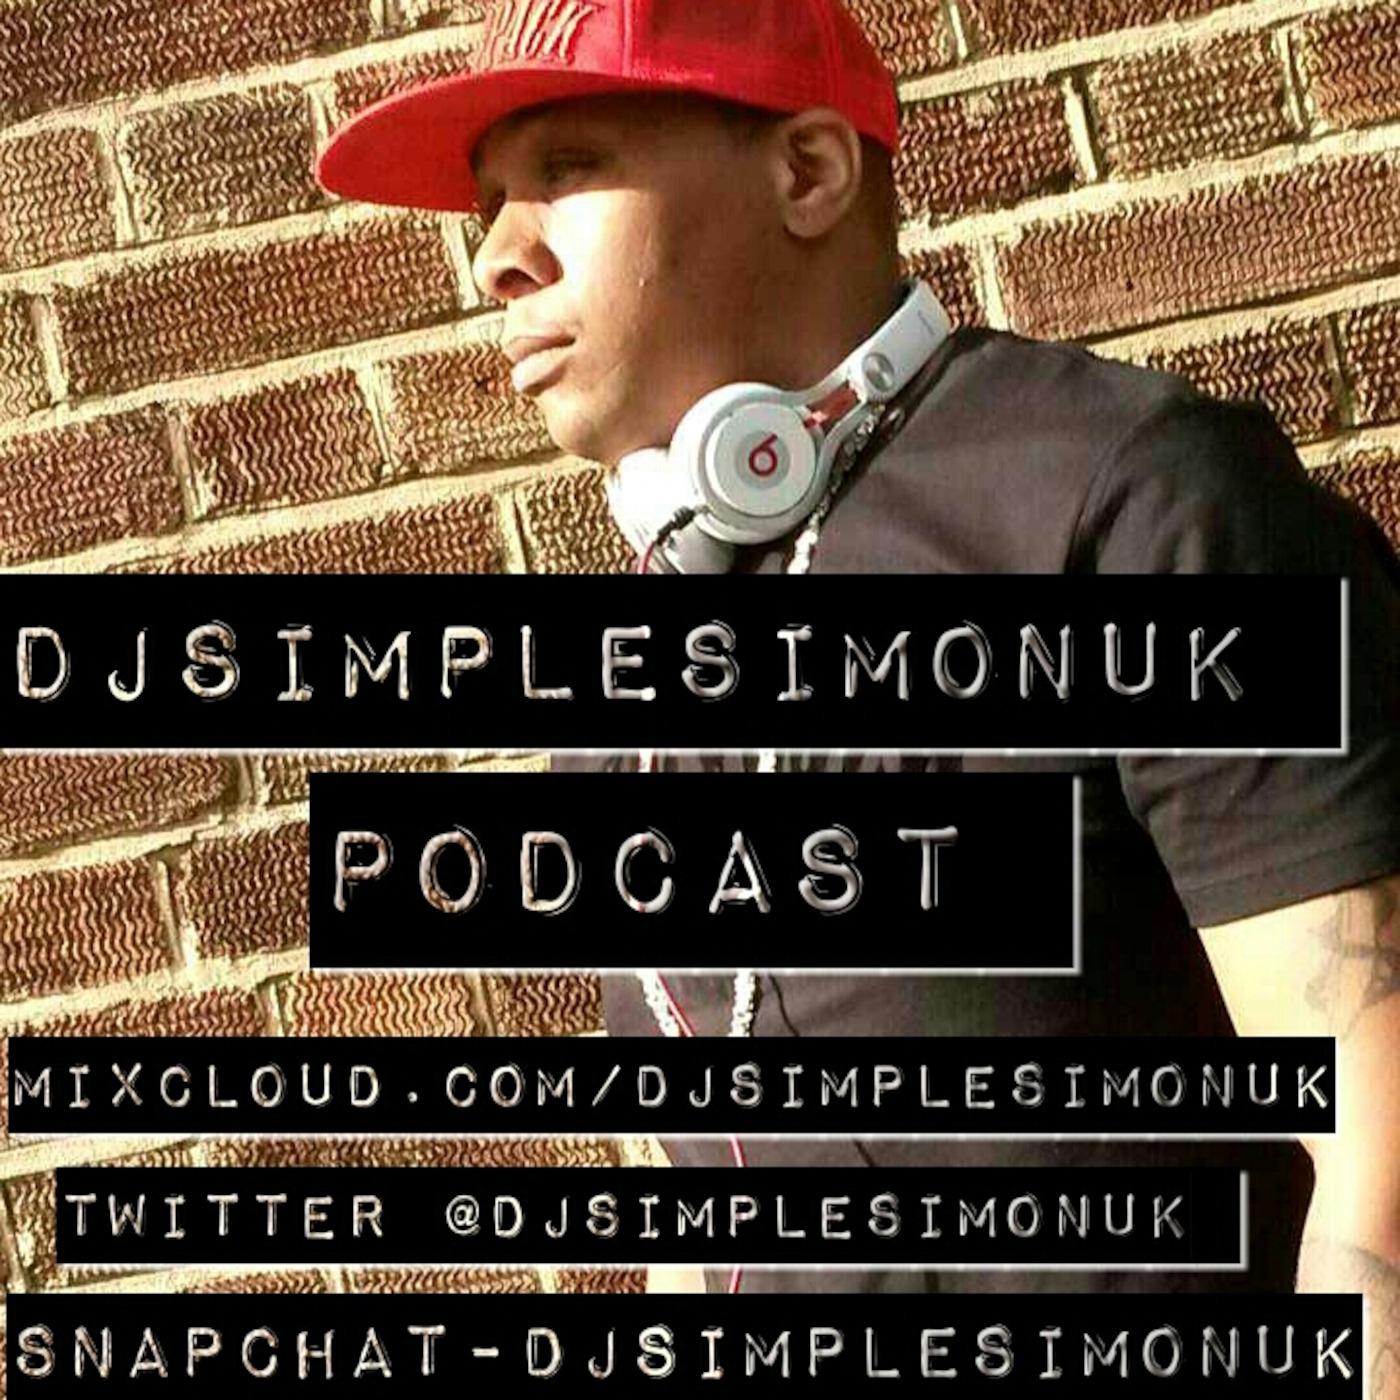 Dj SimpleSimonuk 'Podcast